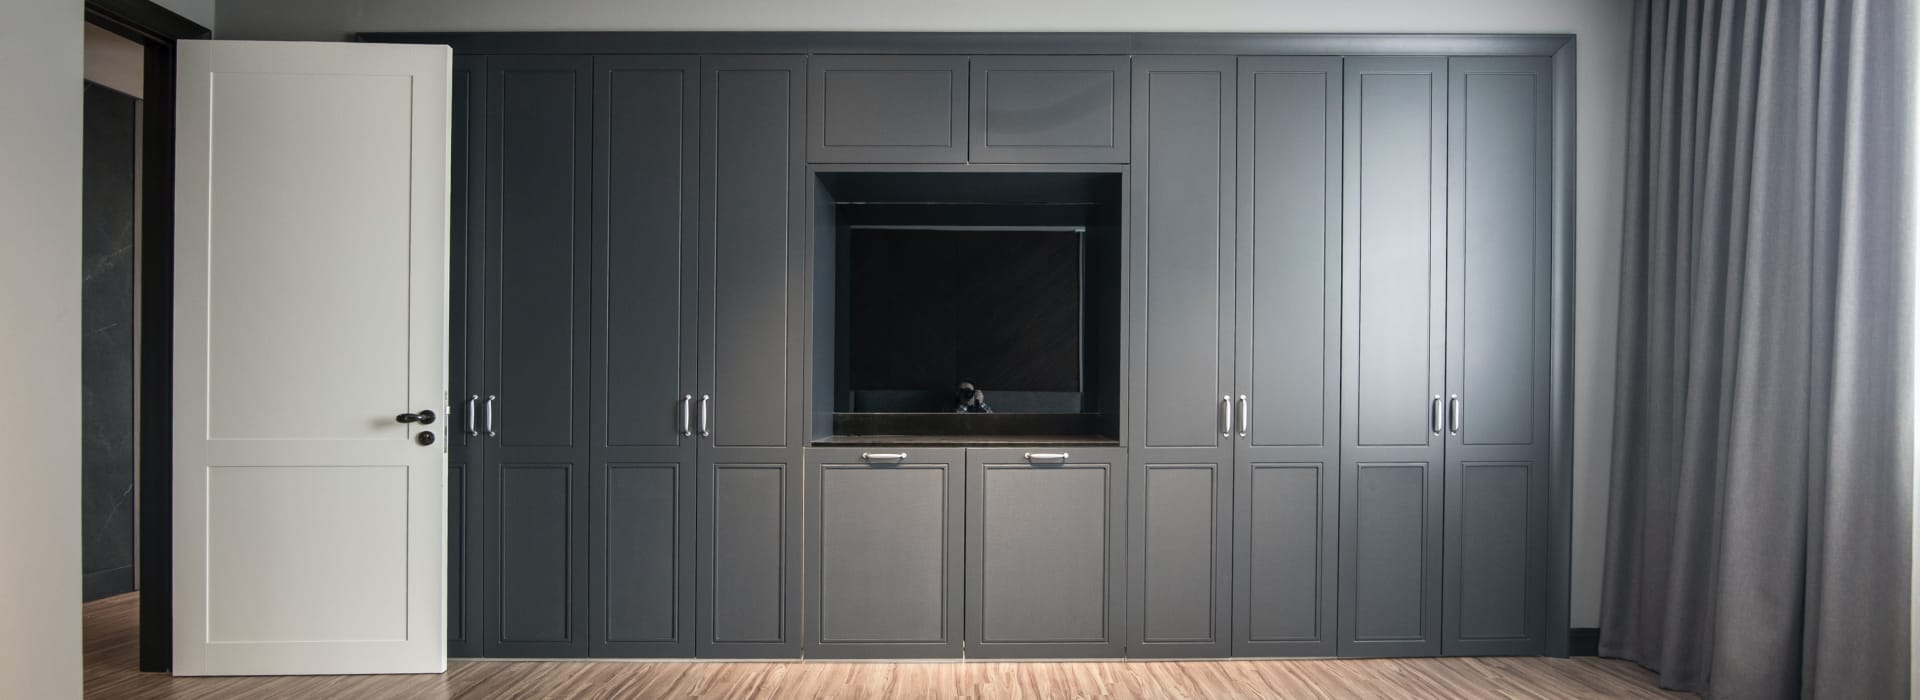 new wardrobe doors